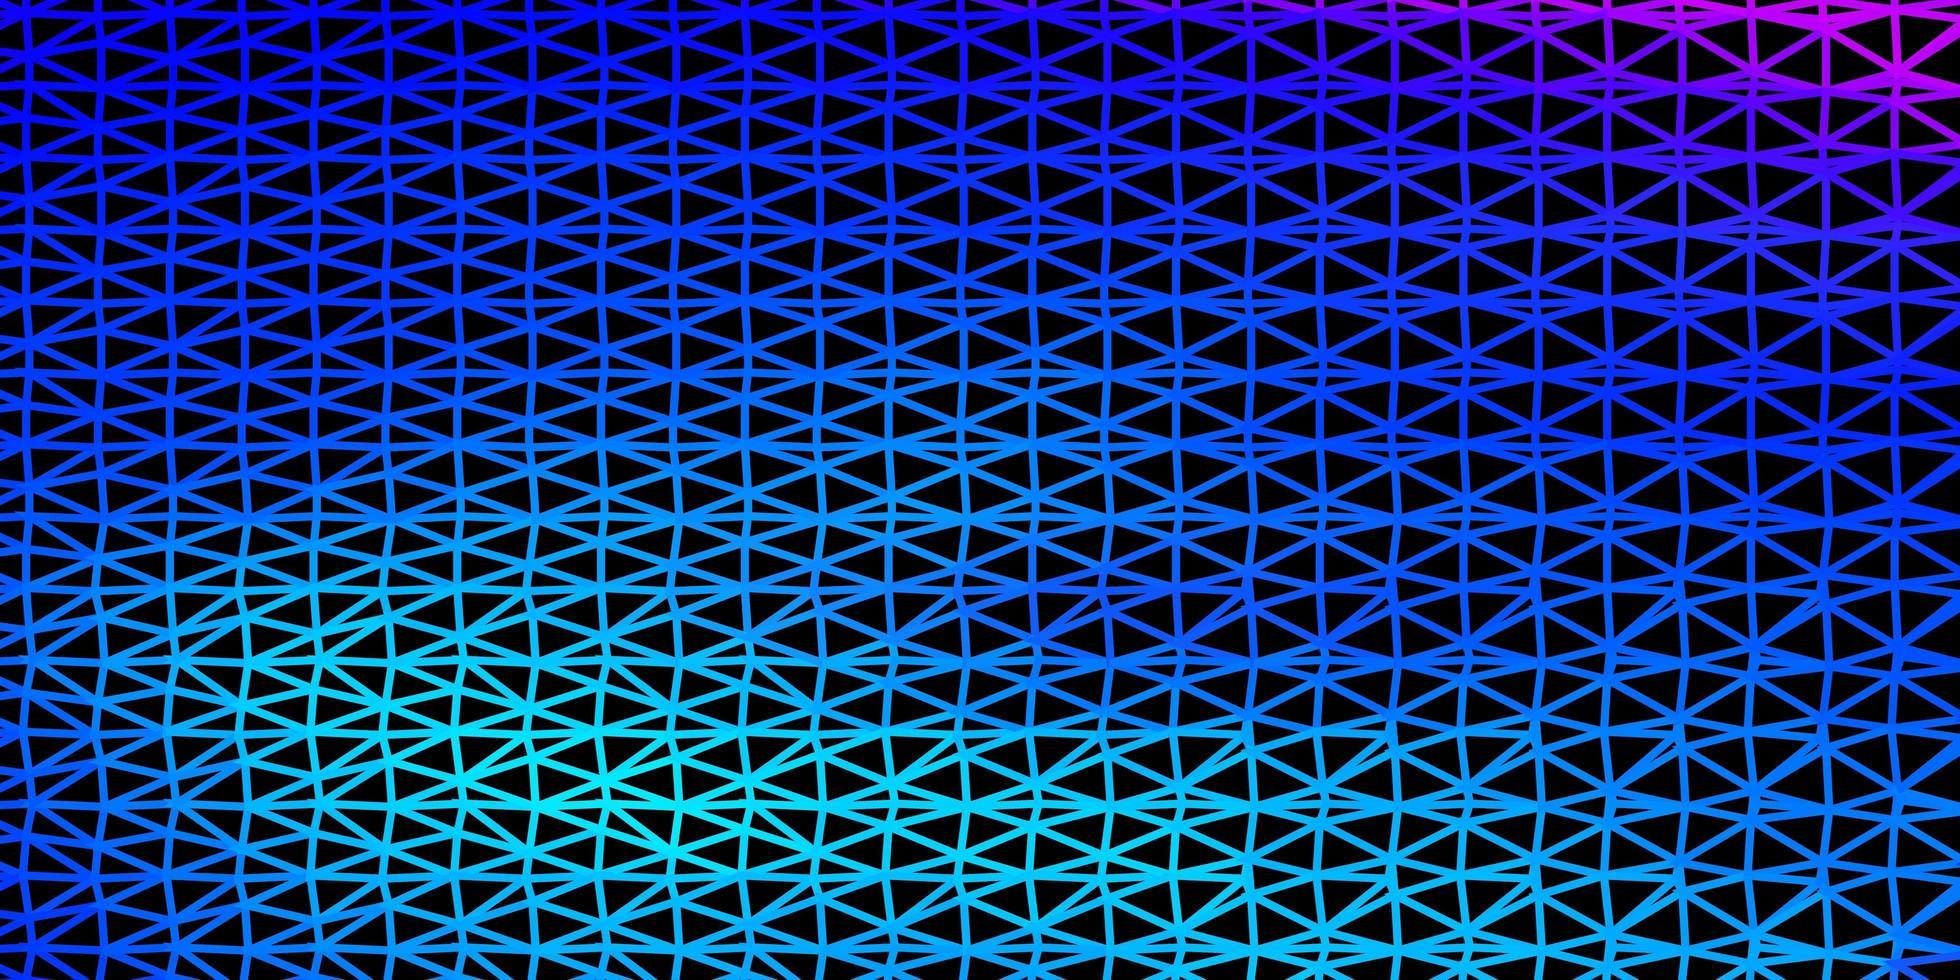 hellrosa, blauer Vektordreieckmosaikhintergrund. vektor